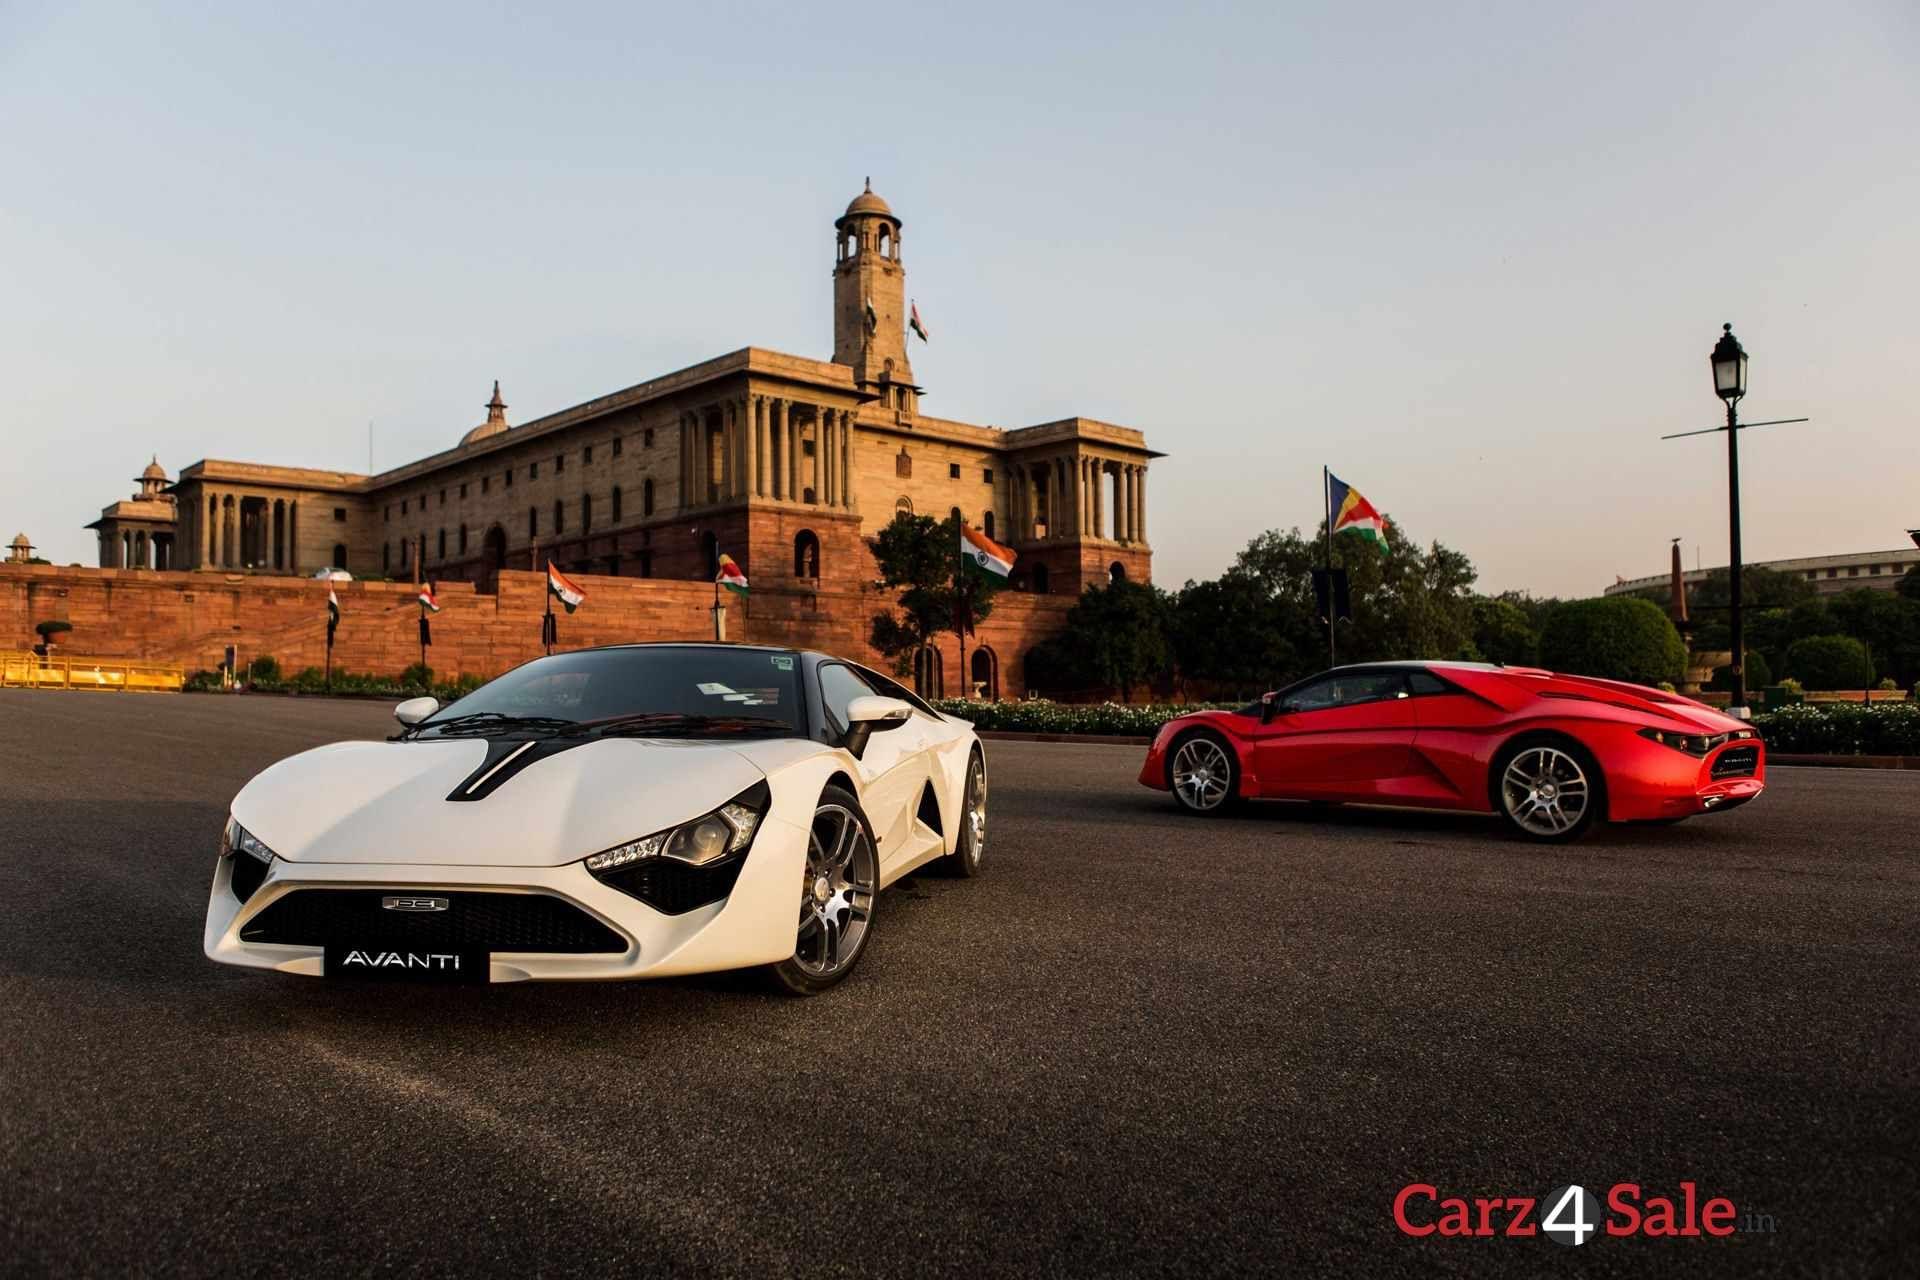 DC Avanti Sports car, Affordable sports cars, Car